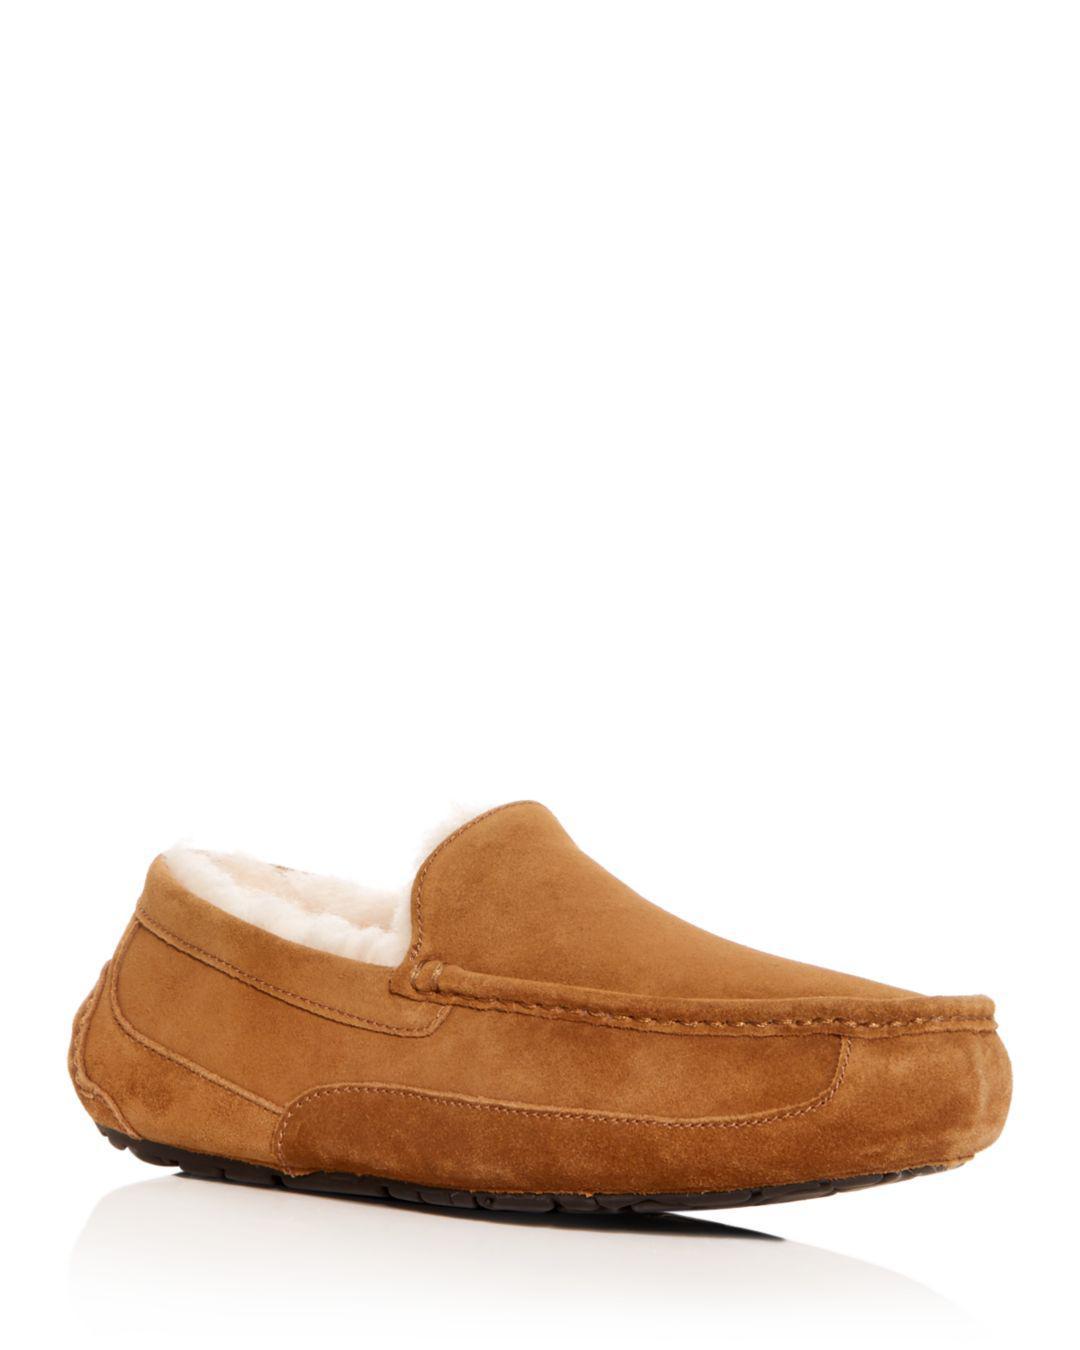 38fd8644362c Lyst - UGG Men s Ascot Suede Slippers in Brown for Men